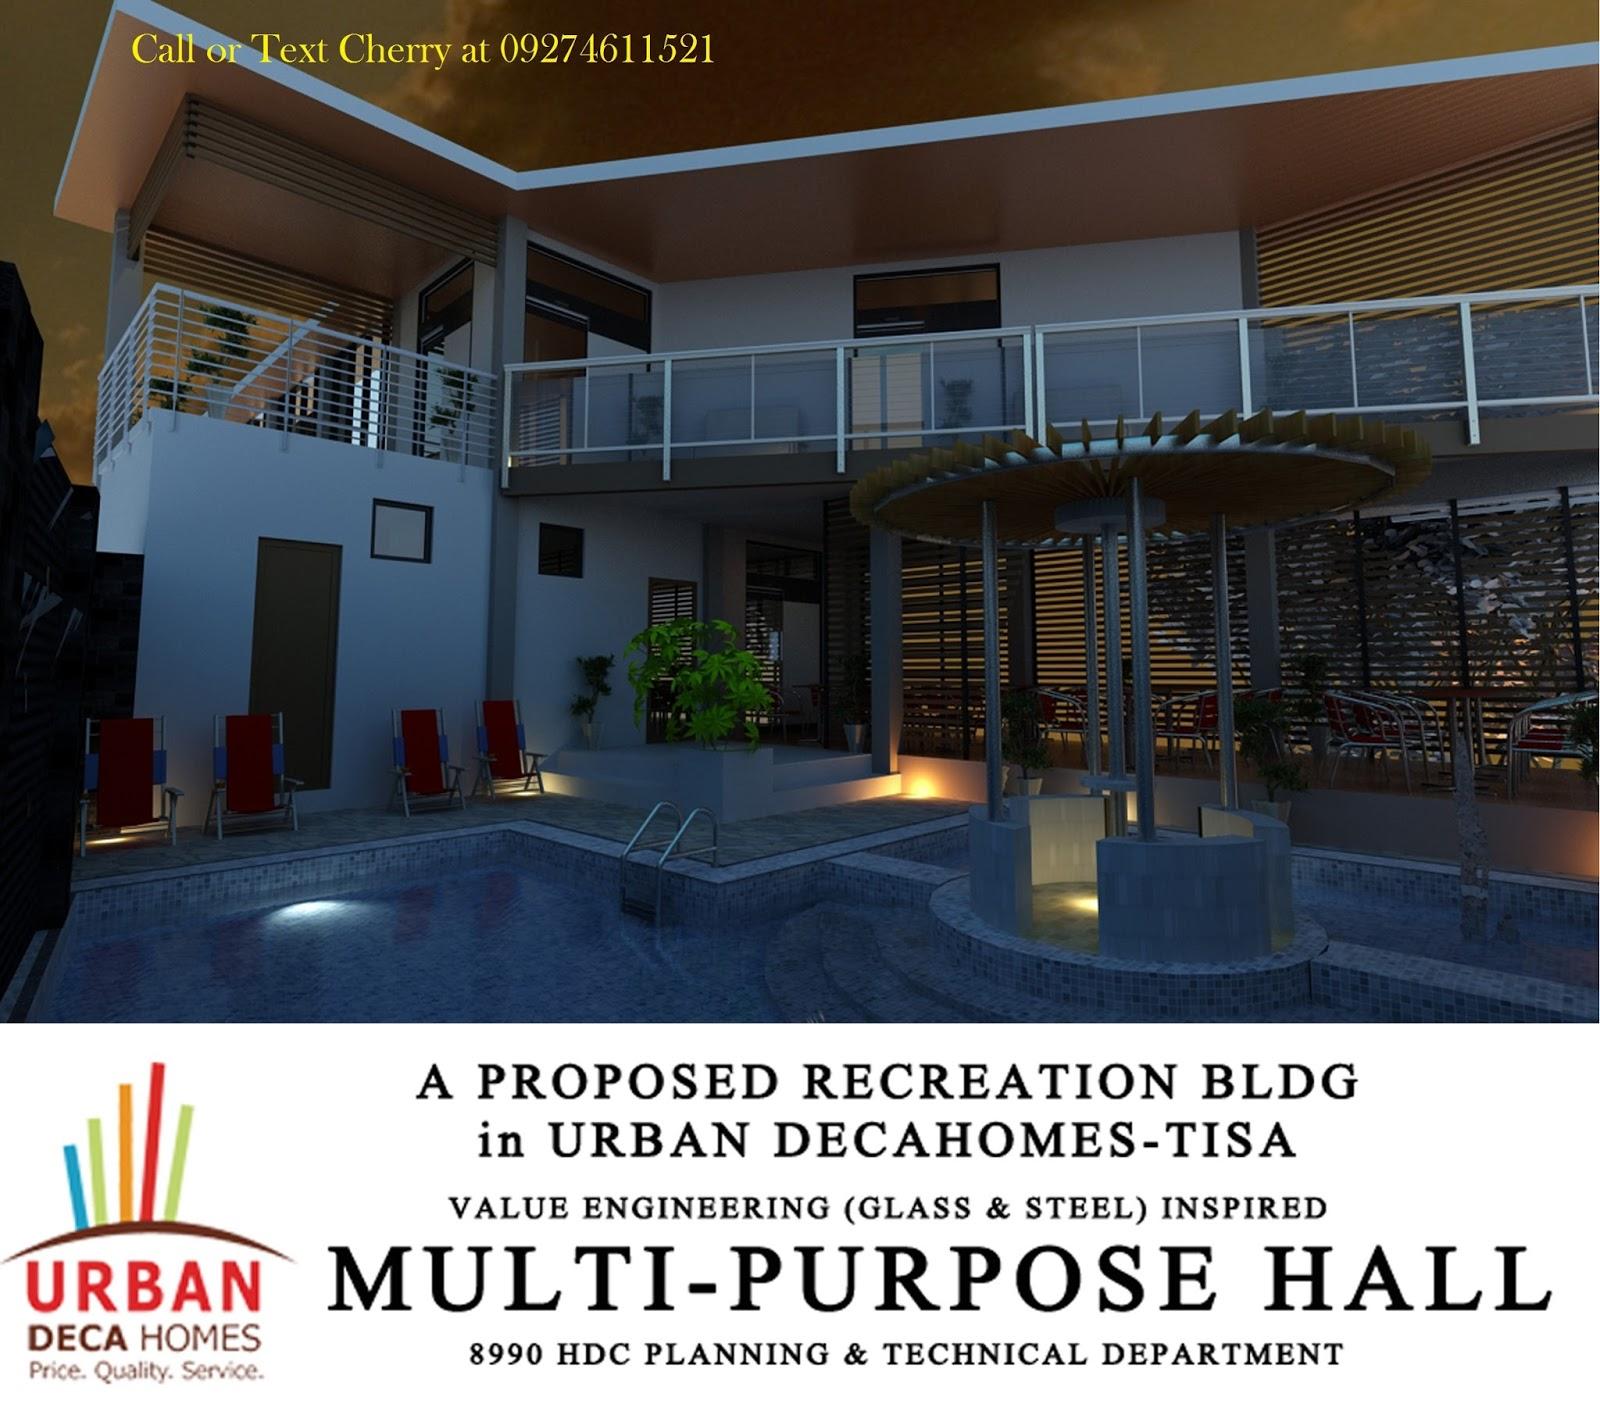 Real Estate In Cebu Urban Deca Homes Condominium Tisa Labangon Cebu City